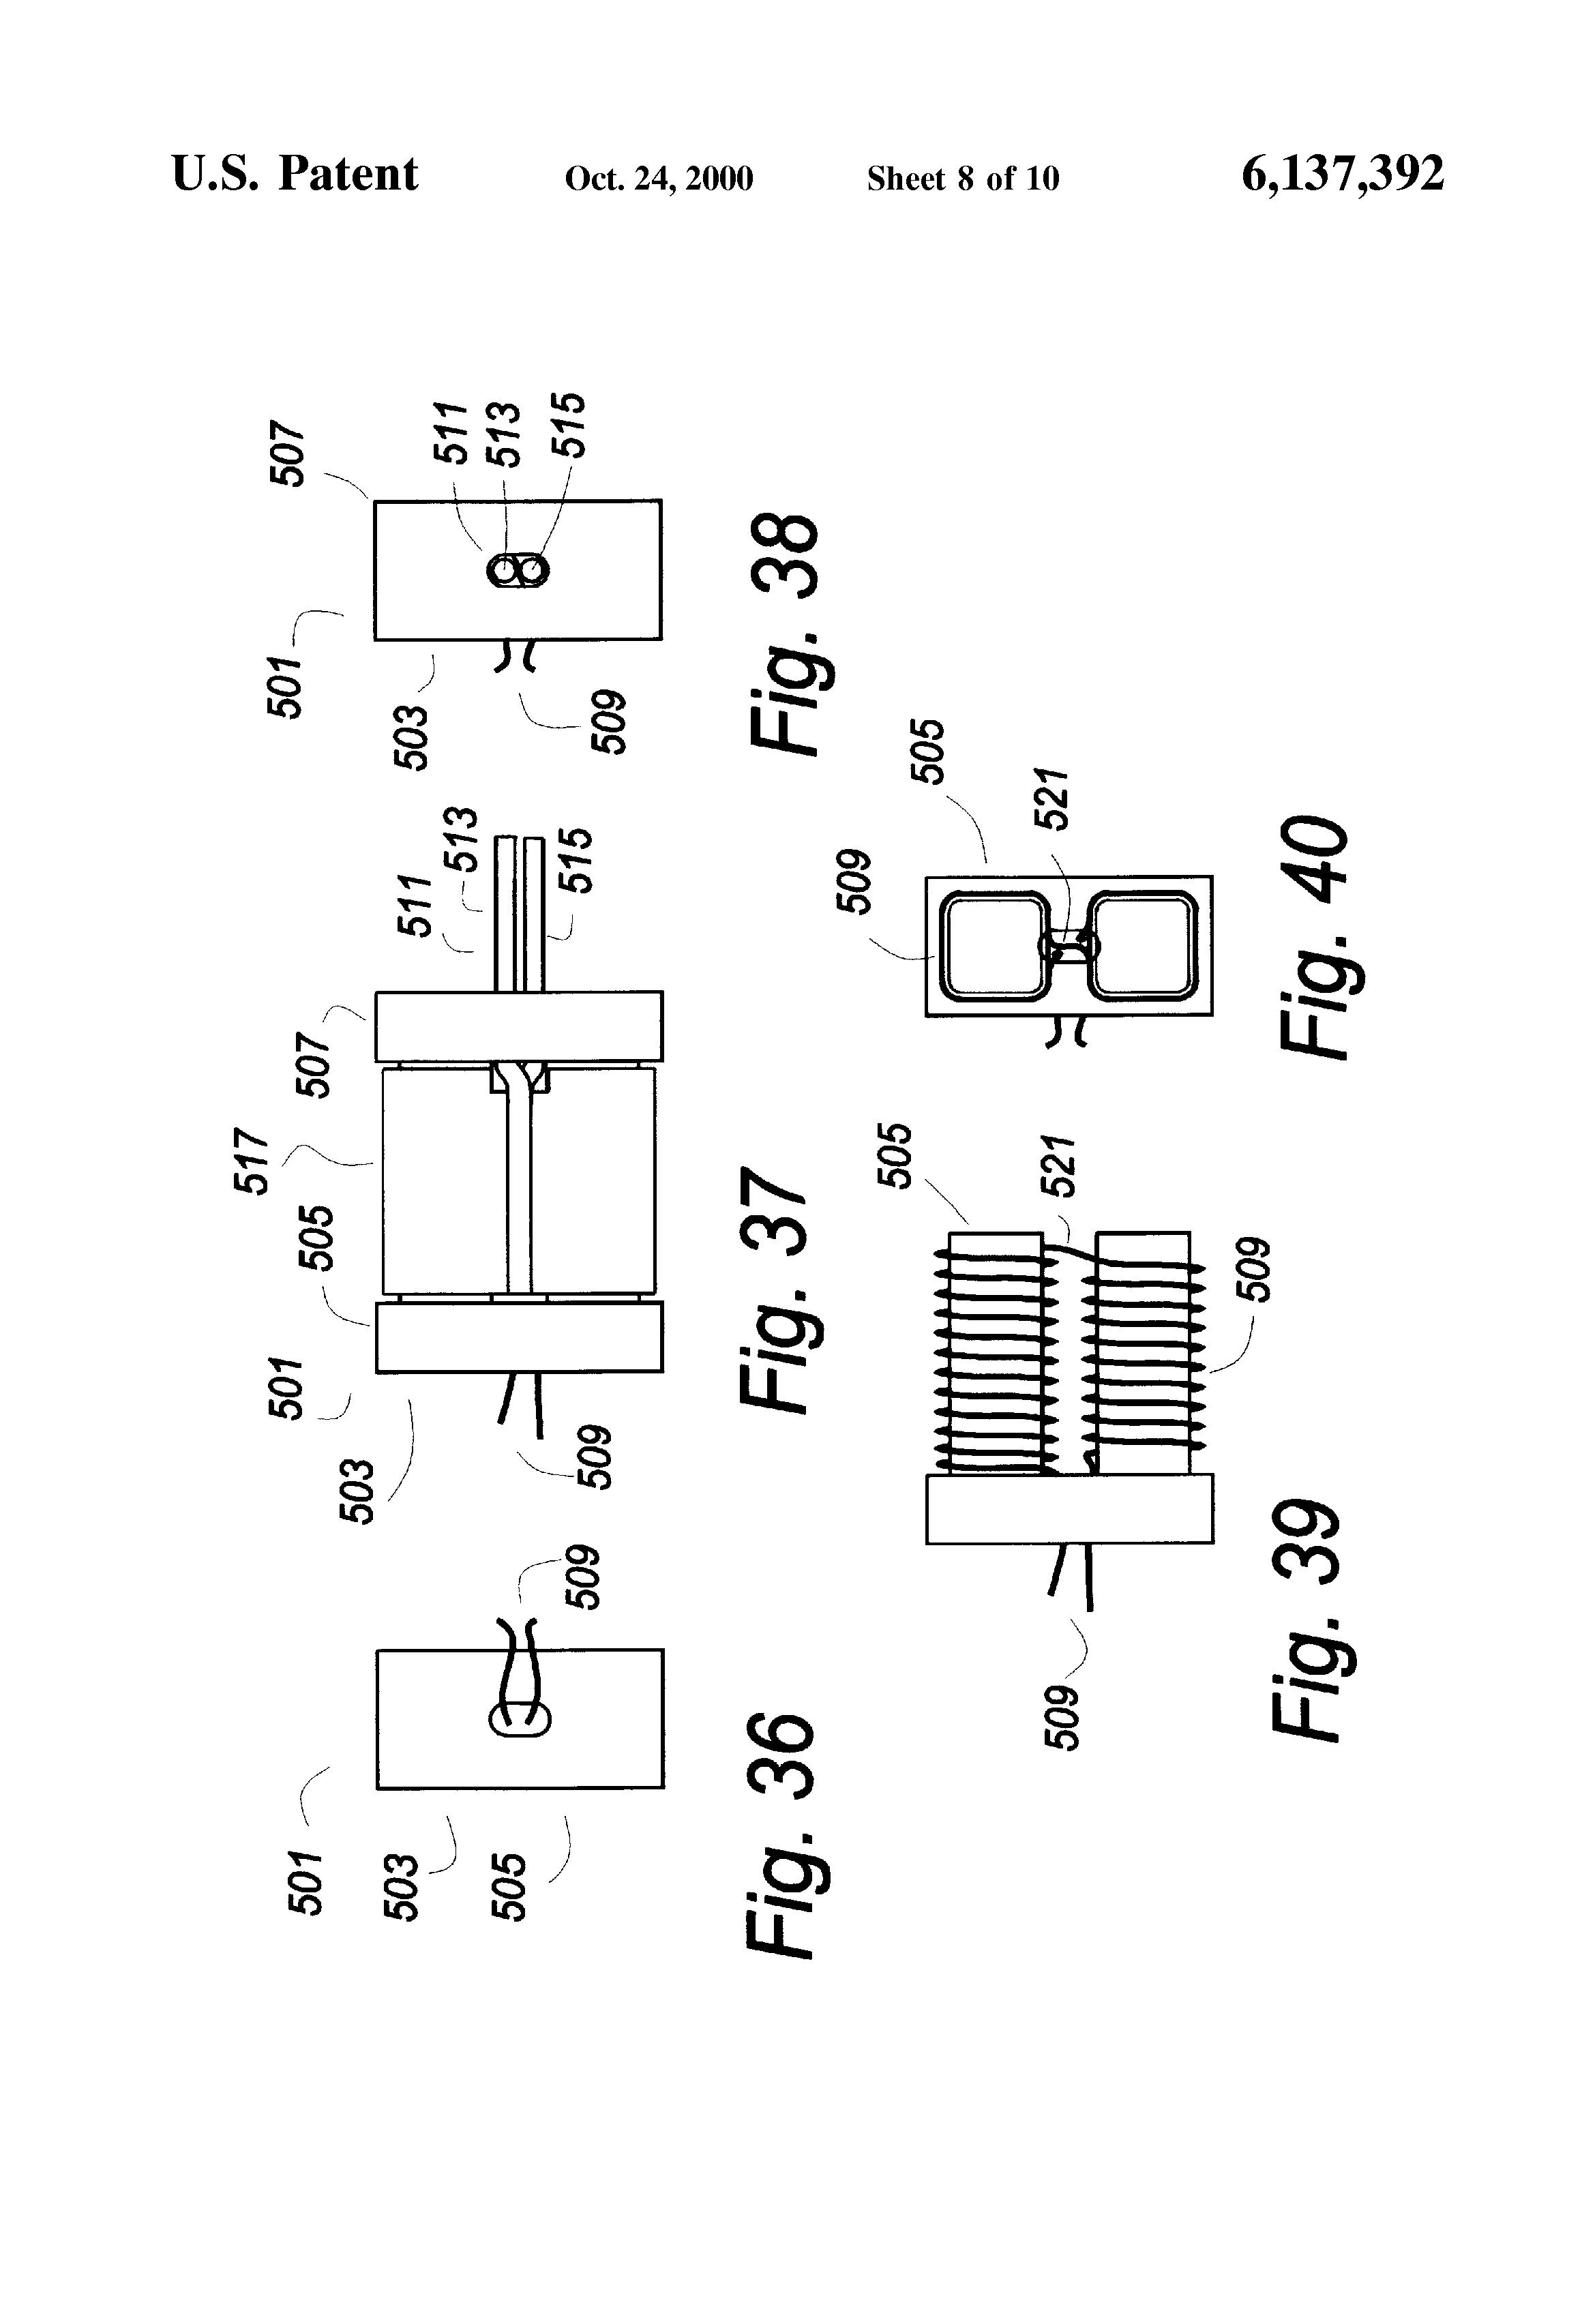 Control Transformer Wiring Diagram 480 120 Wiring